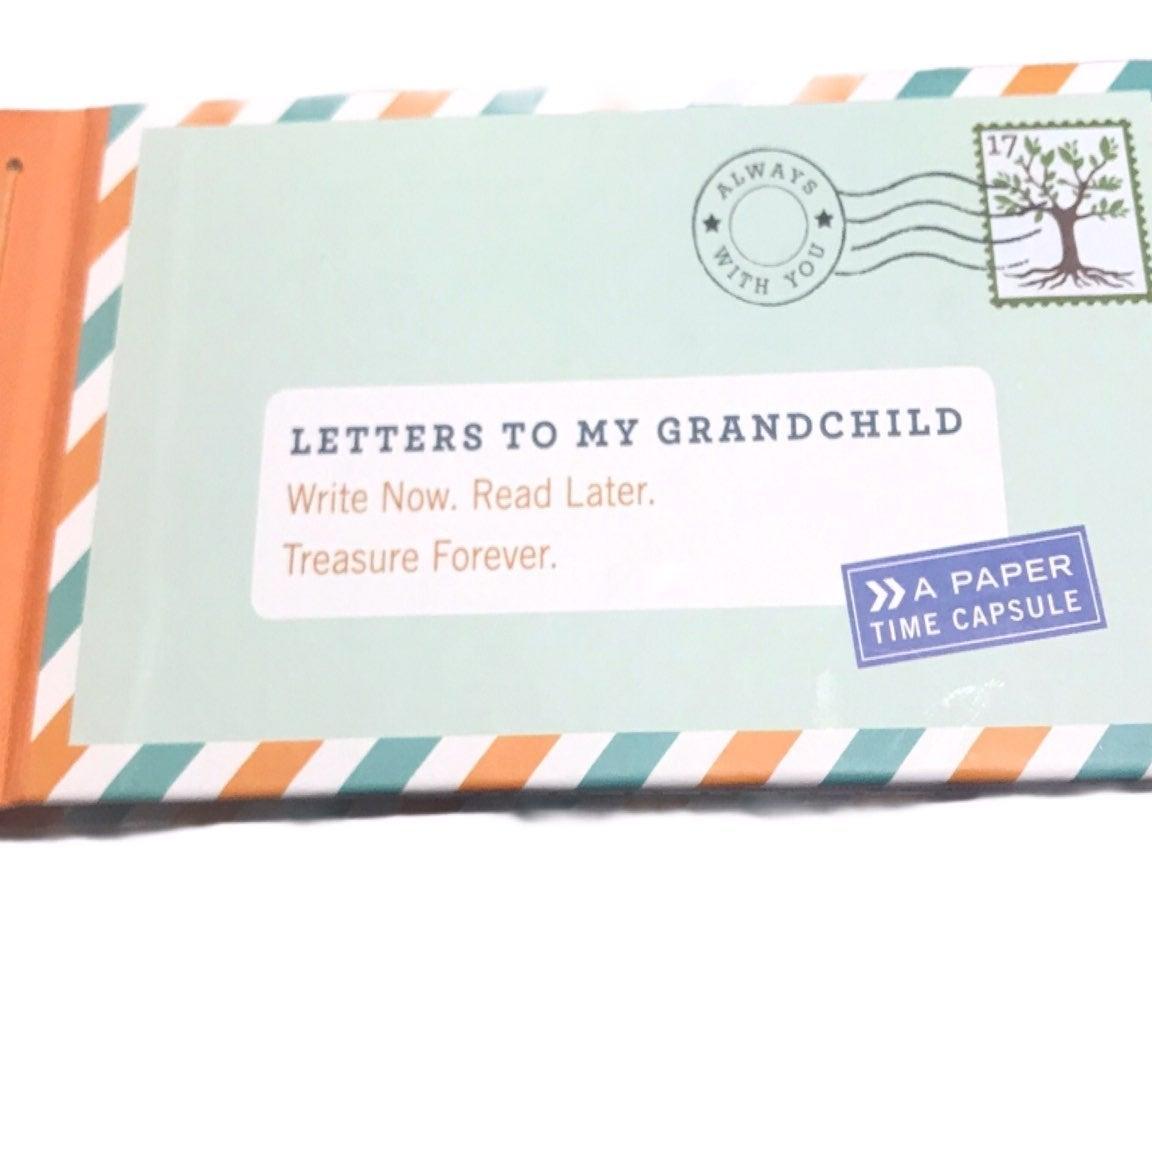 Letters to Grandchild Paper Time Capsule